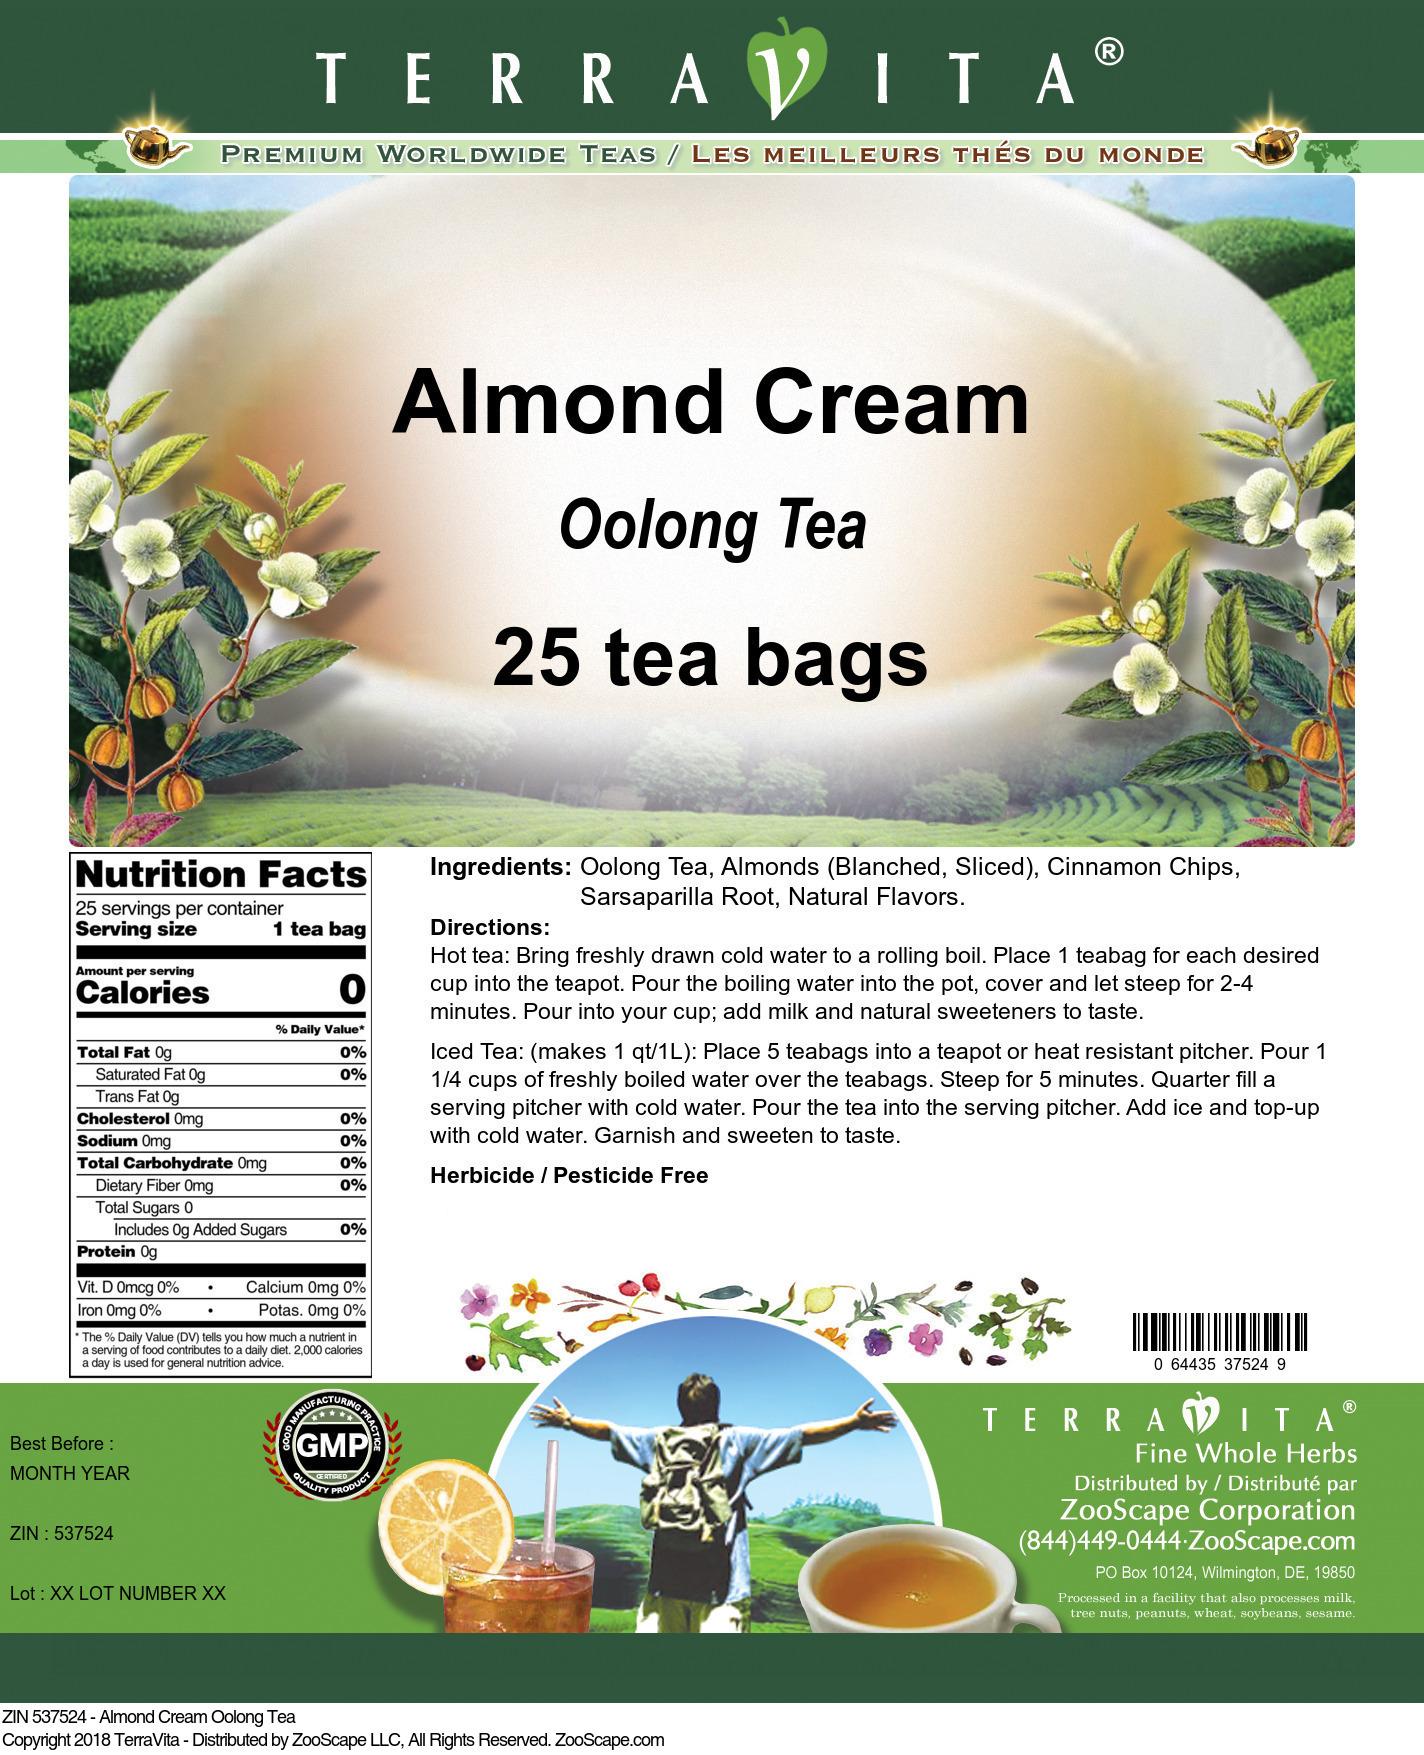 Almond Cream Oolong Tea